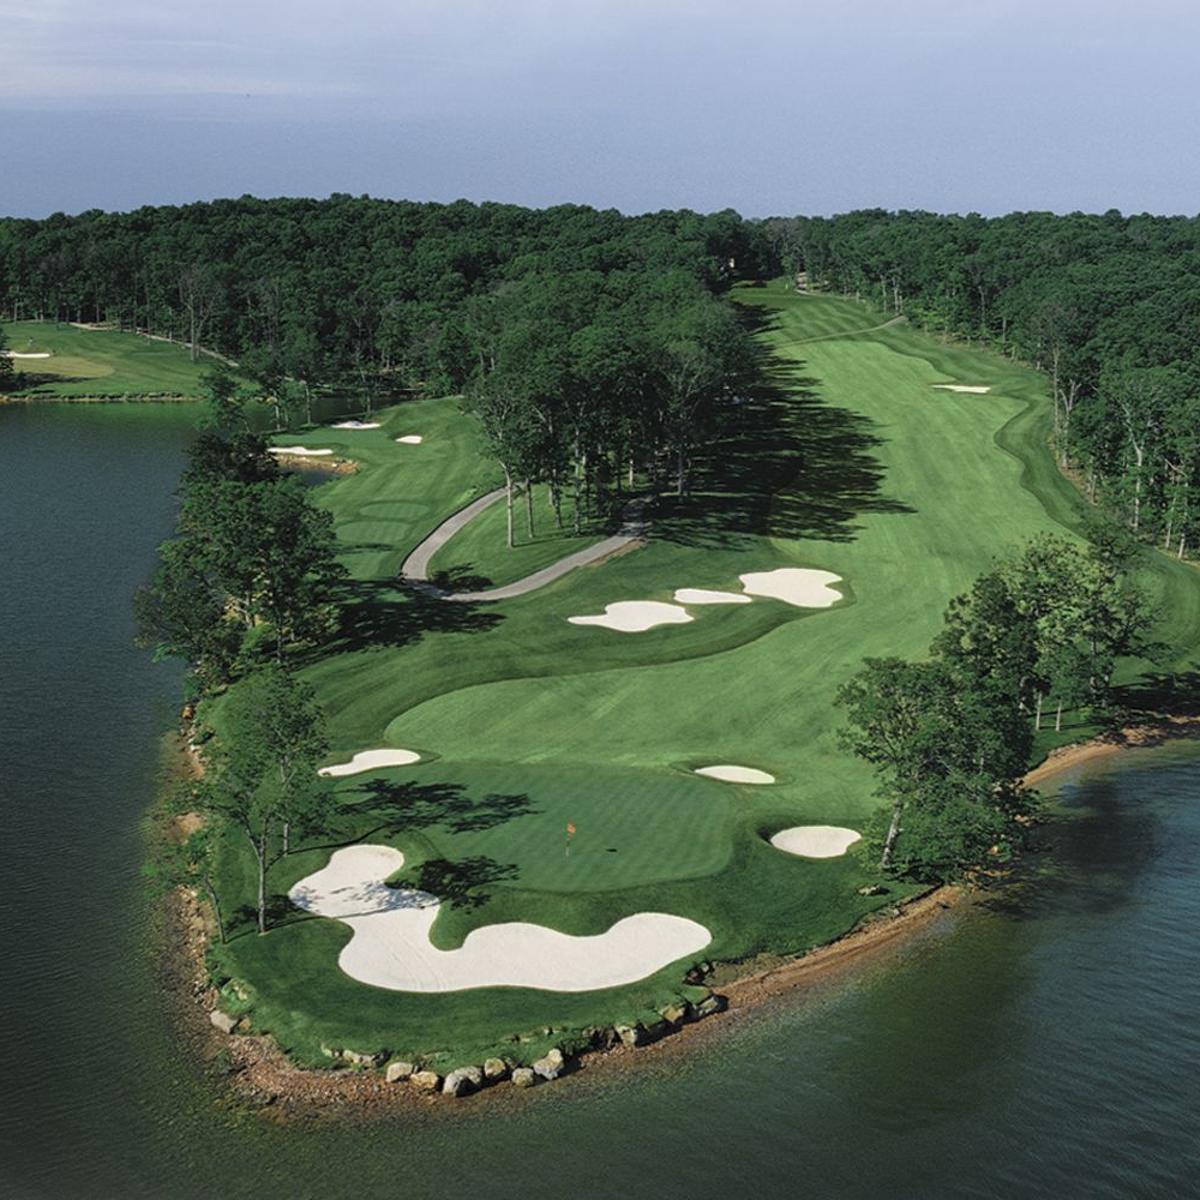 Ozarks Porto Cima Course Still A Gem At 20 Years Old Golf Guide Stltoday Com